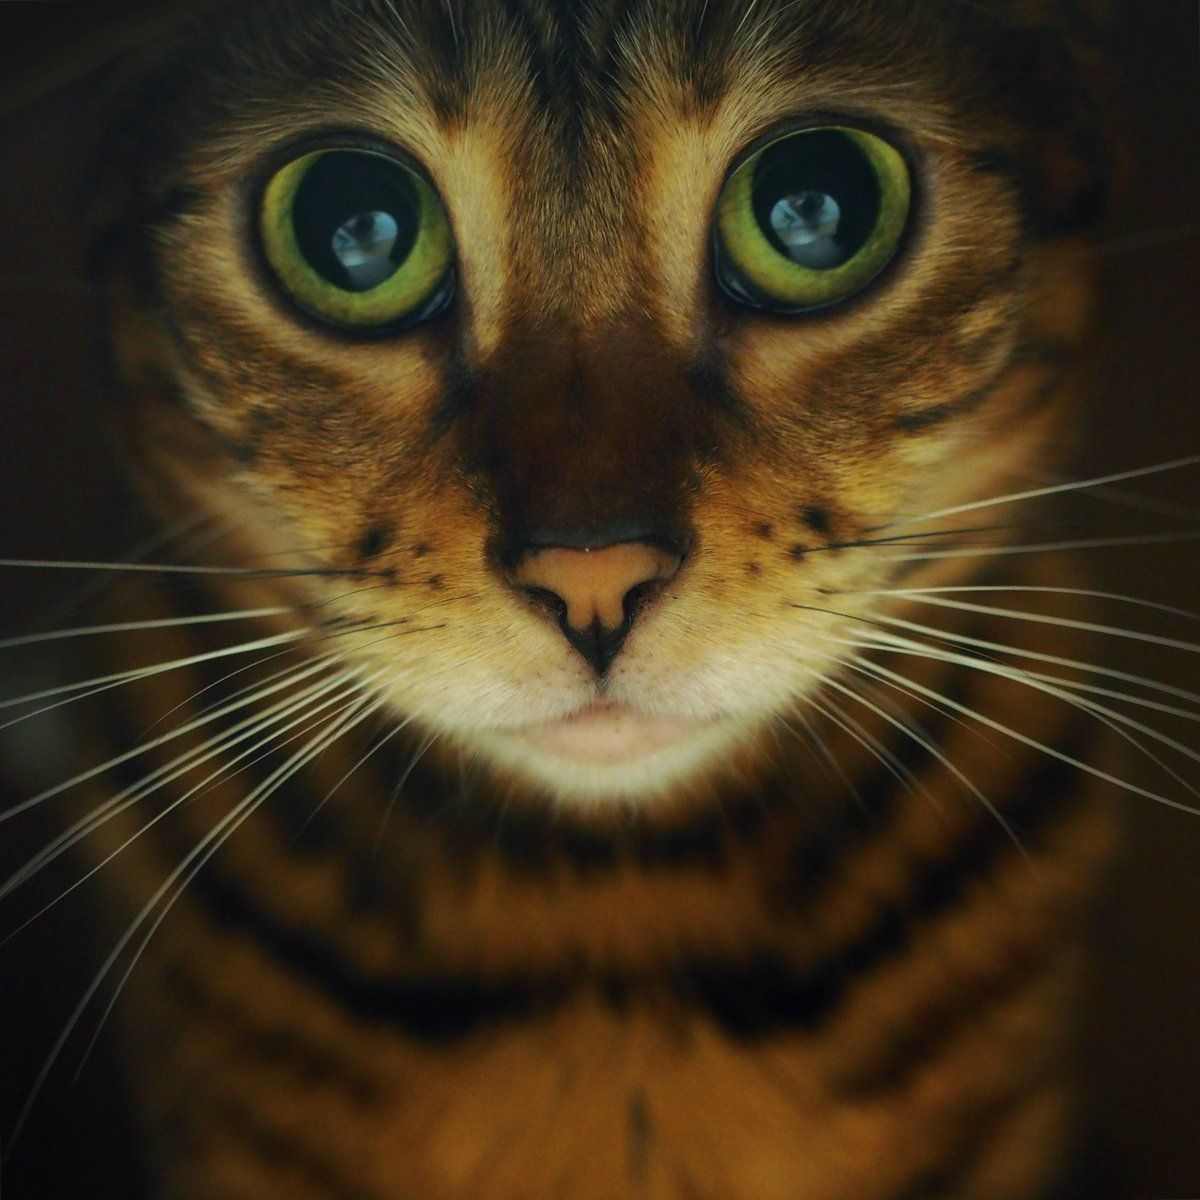 Cats Cat Kittens Kitten Kitty Pets Pet Meow Moe CuteCats